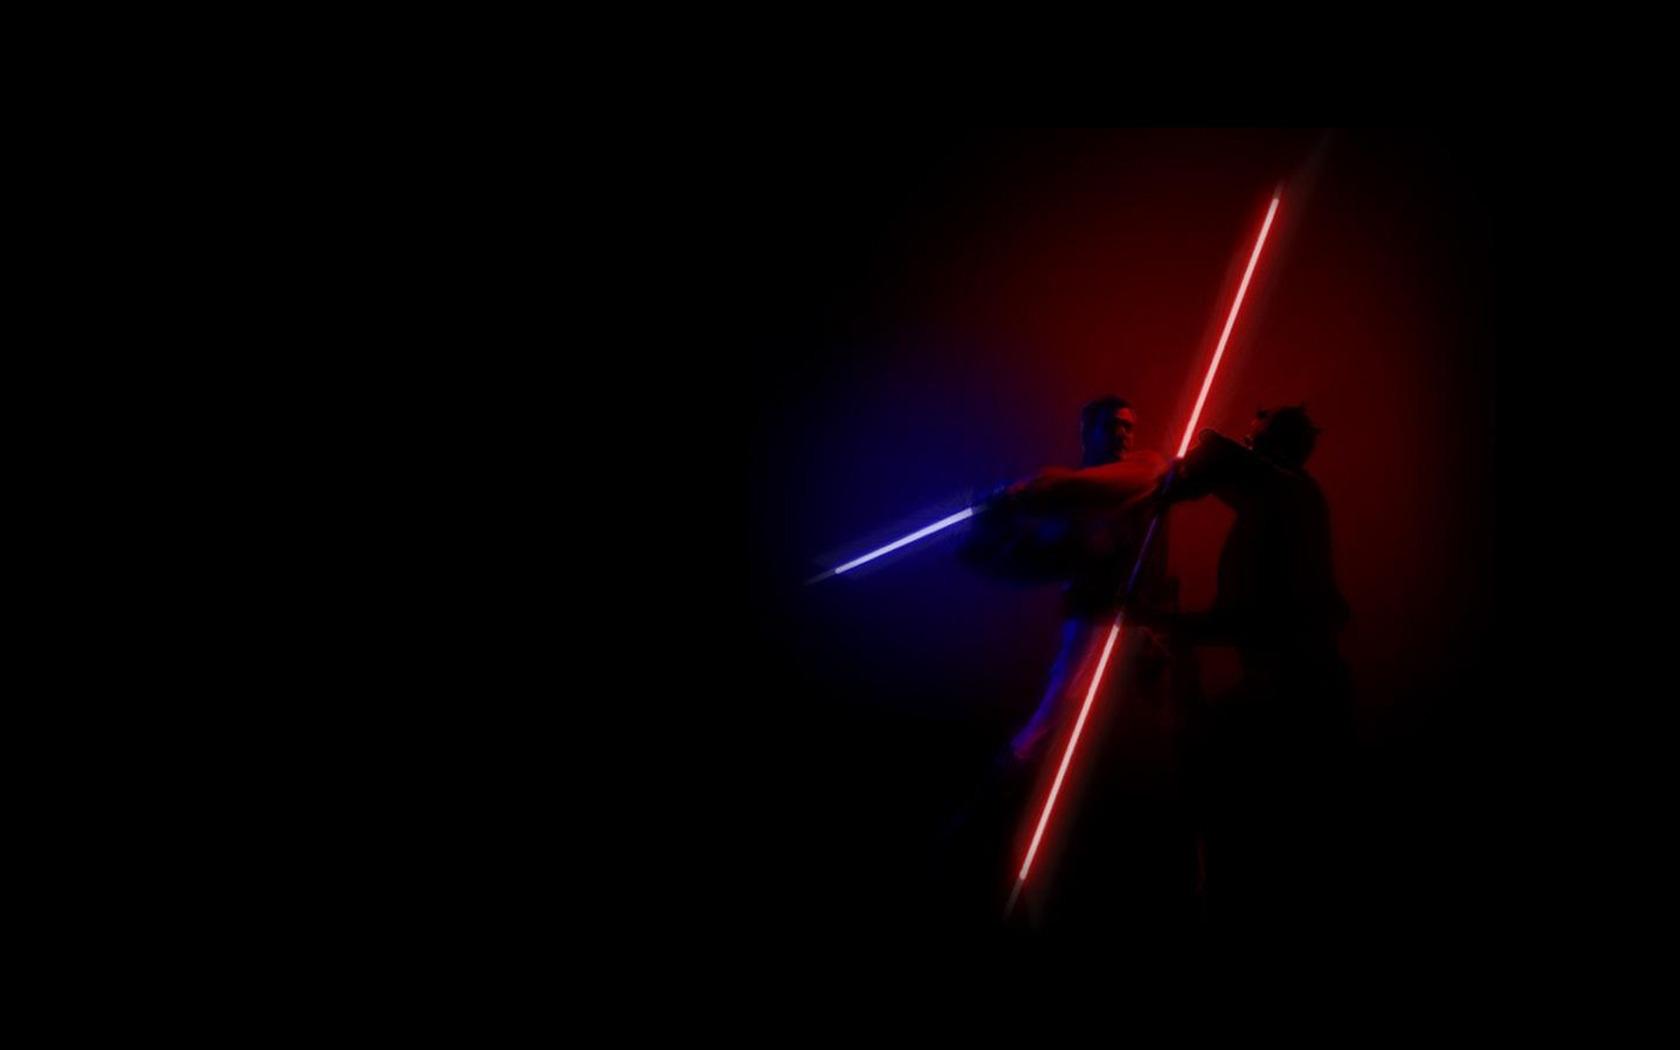 Free Download Pictures Star Wars Darth Maul Obi Wan Kenobi Lightsabers 1680x1050 For Your Desktop Mobile Tablet Explore 45 Darth Maul Desktop Wallpaper Darth Maul Iphone Wallpaper Star Wars